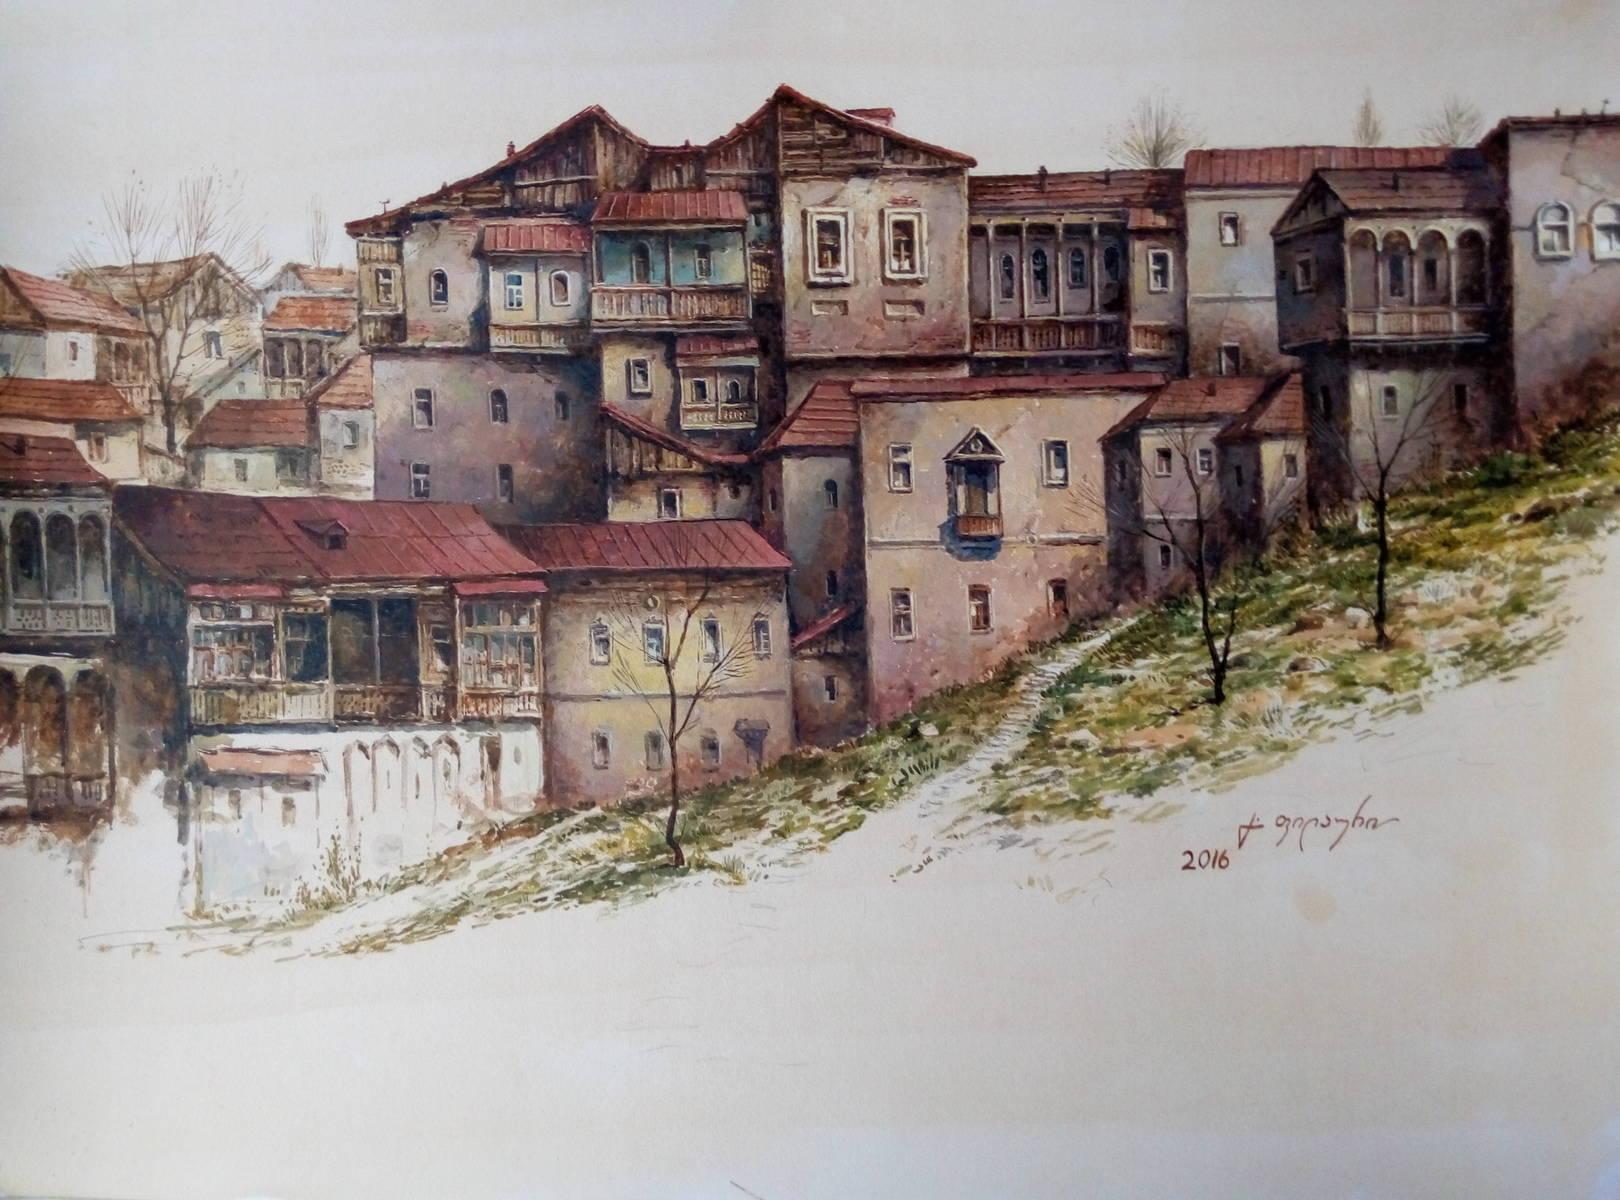 «Старый Тбилиси»     бумага, акварель, гуашь «Old Tbilisi»                  paper, aquarelle, gouache 37x49, 2016